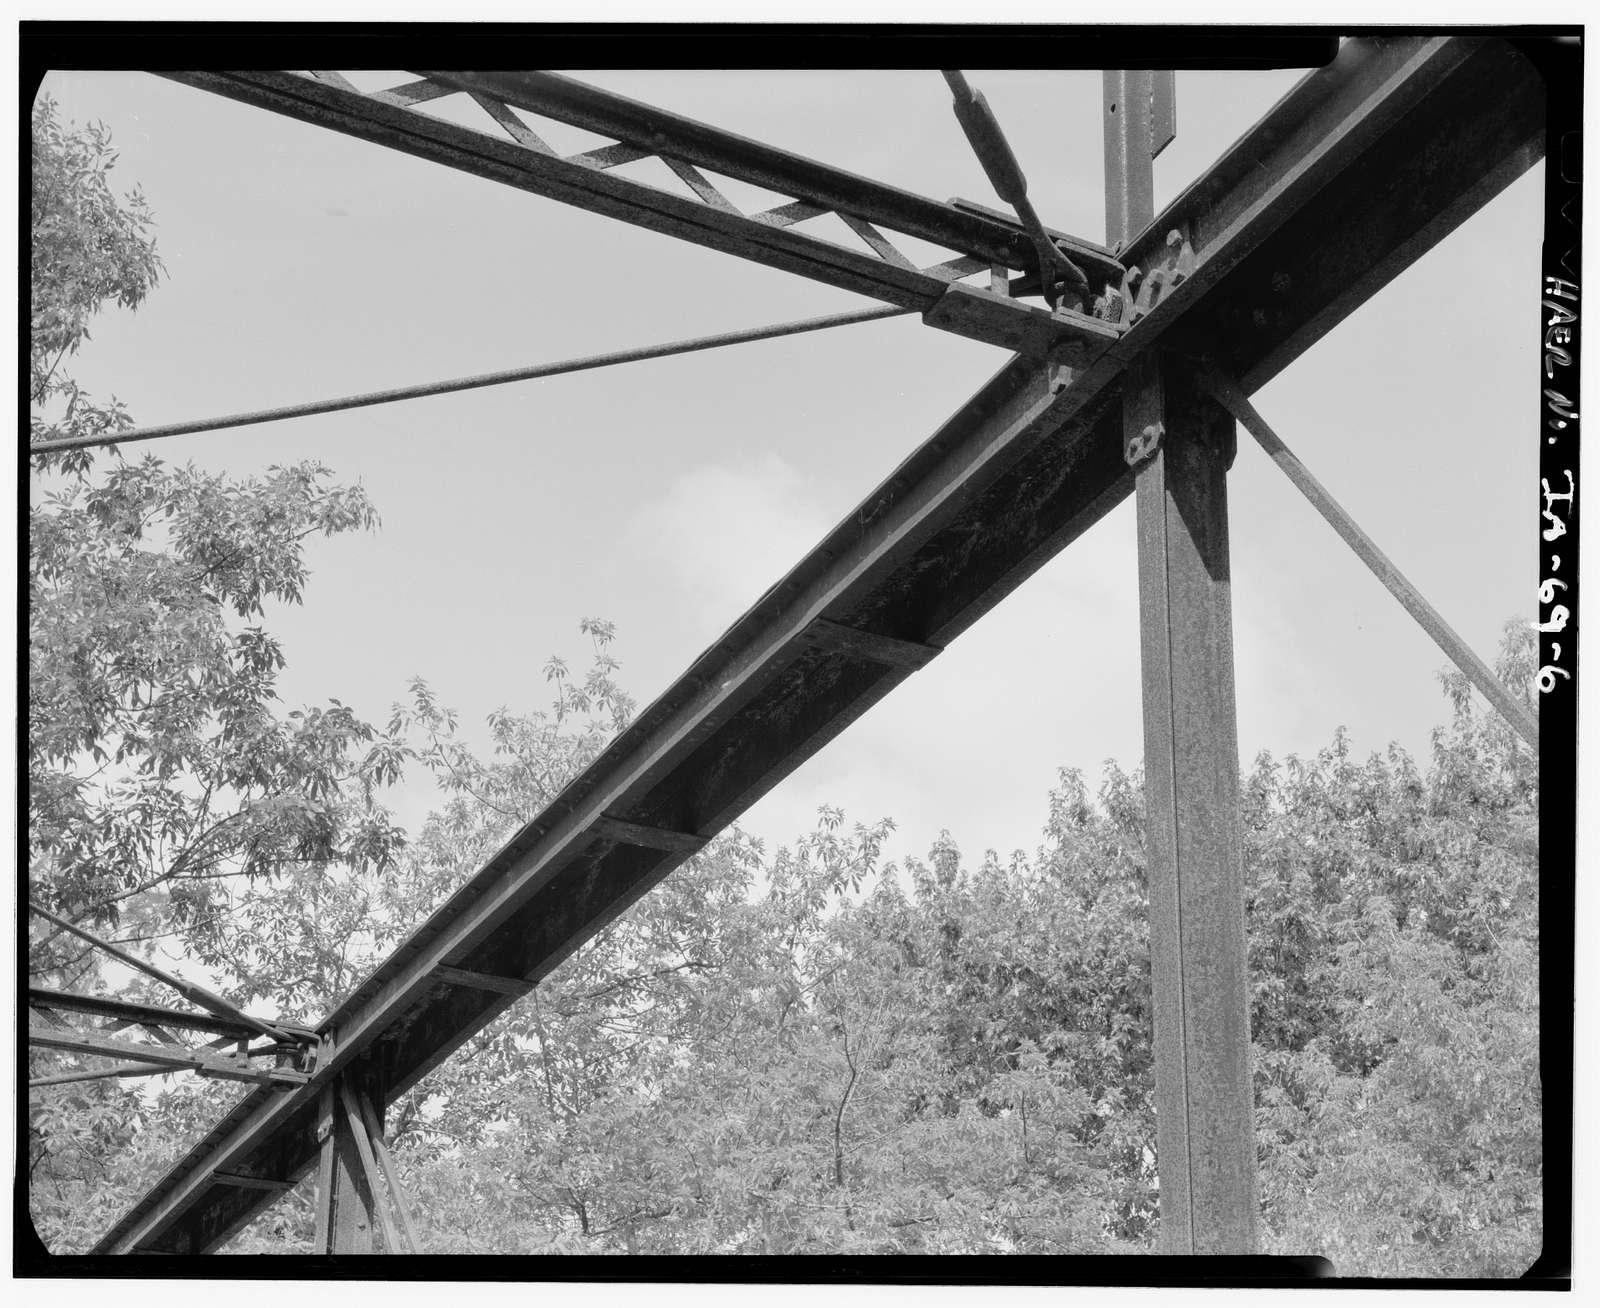 Pine Mill Bridge, Spanning Pine Creek, Muscatine, Muscatine County, IA